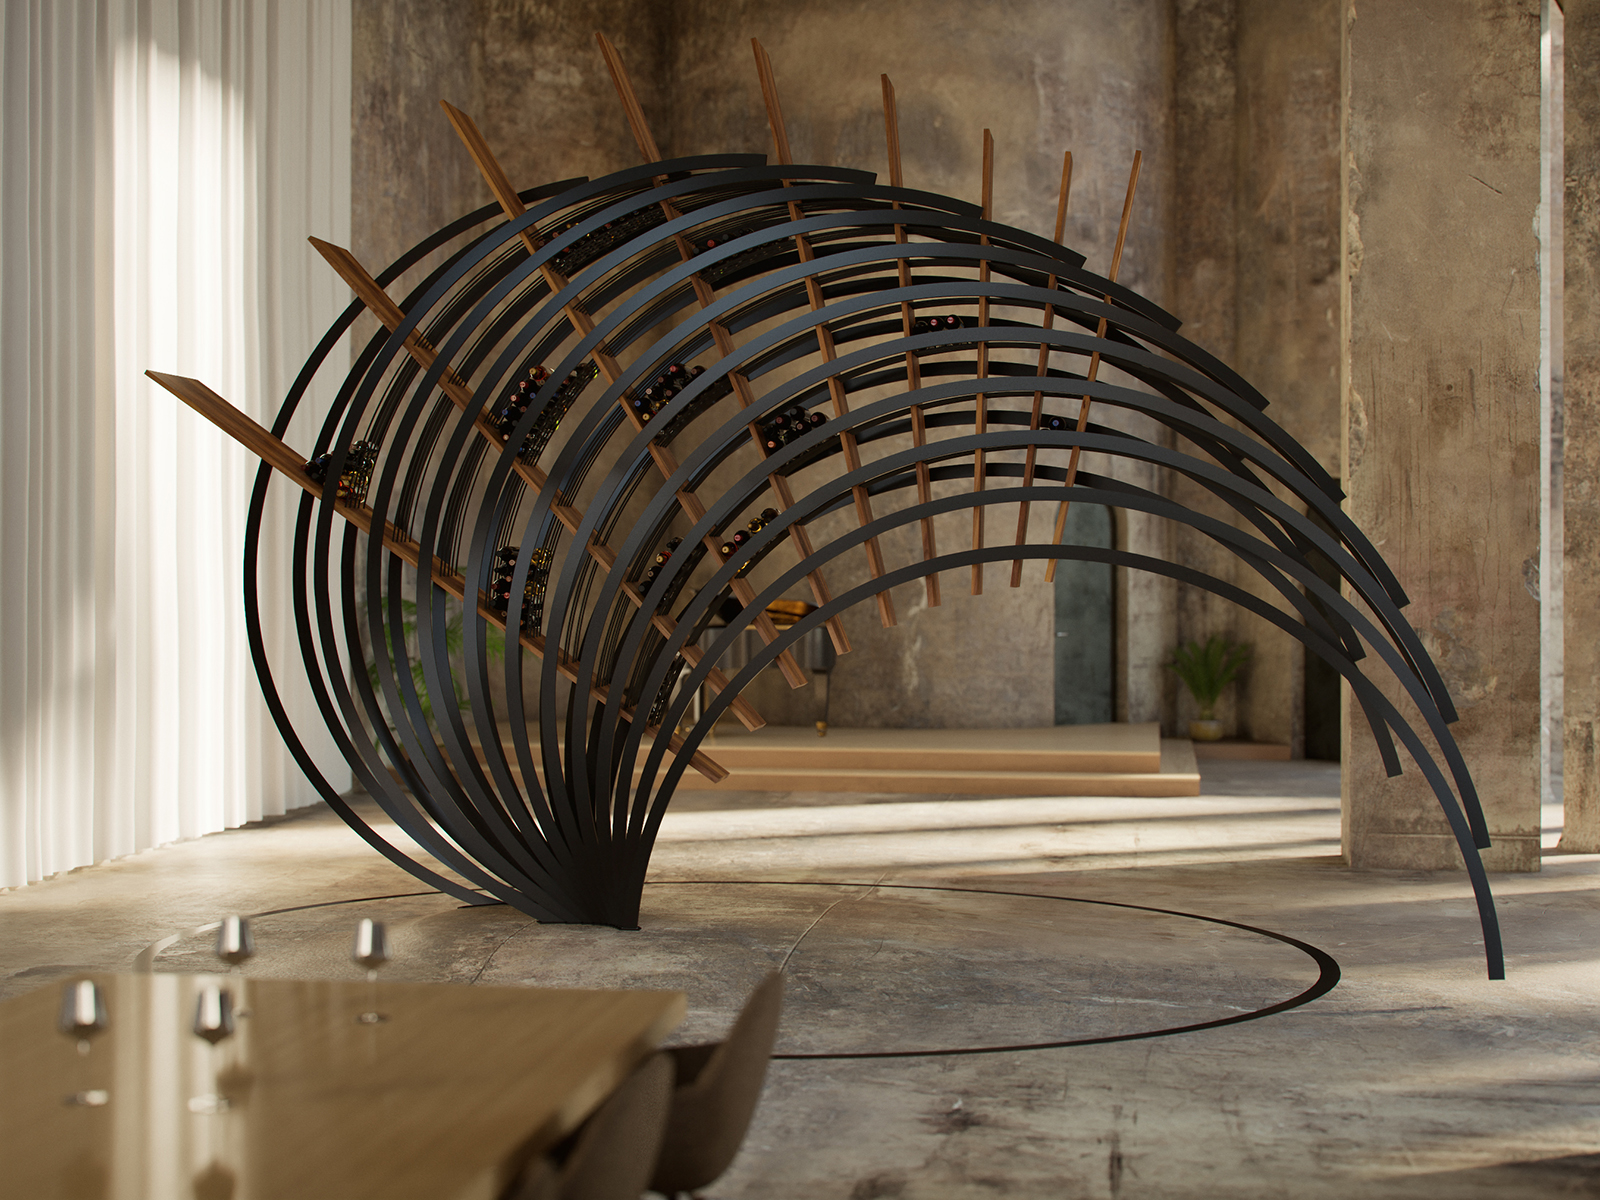 A wave-like geometric wine storage installation